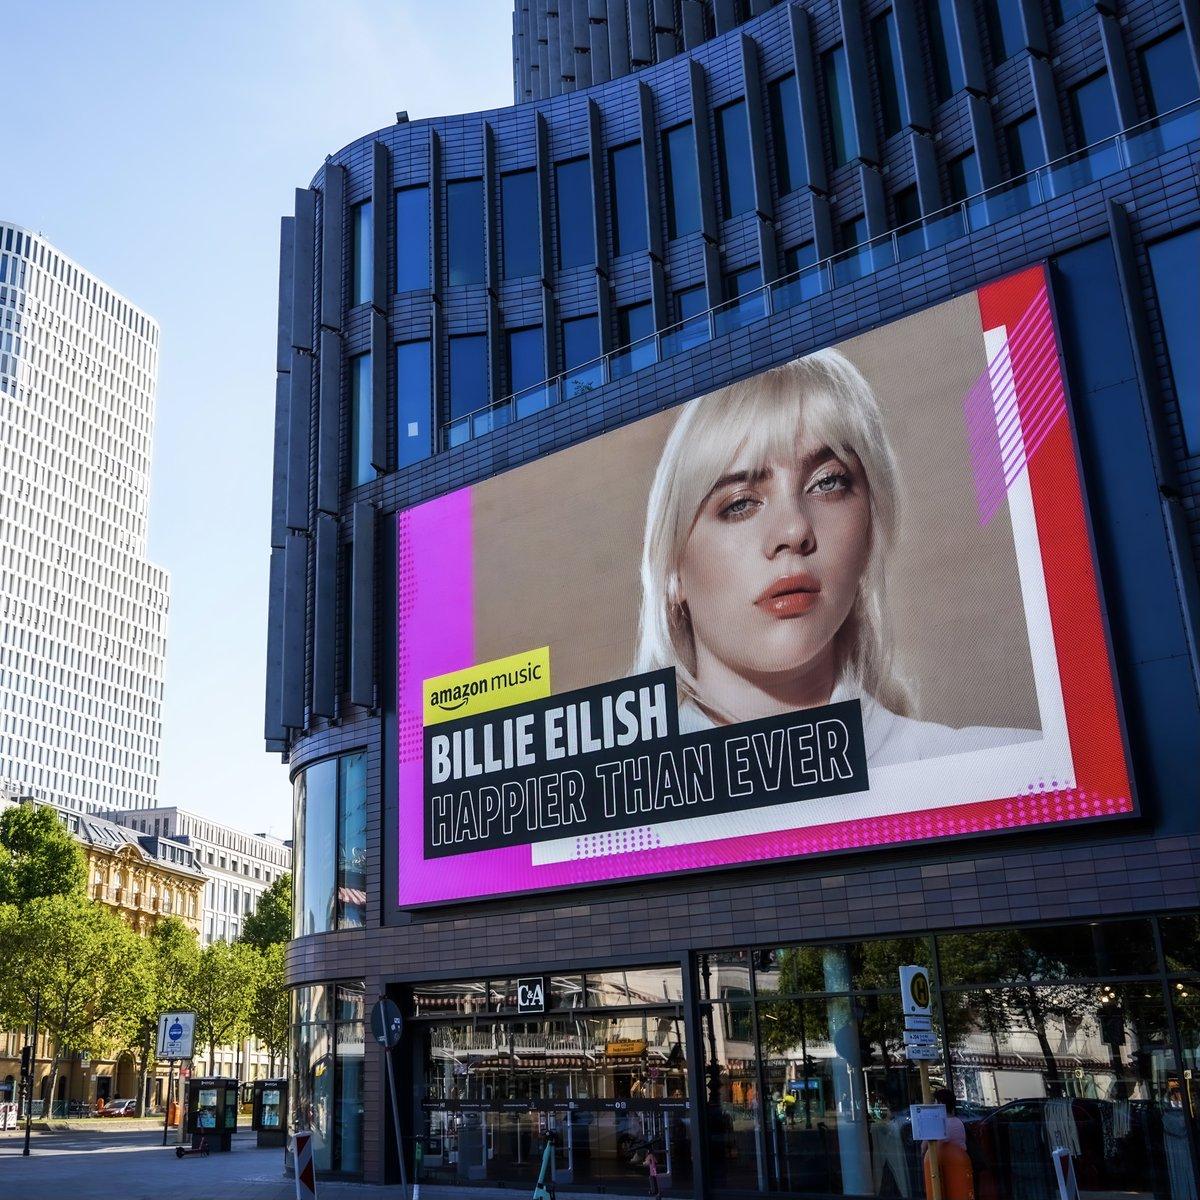 "Billie Eilish - ""Happier Than Ever"" Listen to the new album now on @amazonmusic. https://t.co/zcYSh7osZk https://t.co/ZubkRtdy0U"